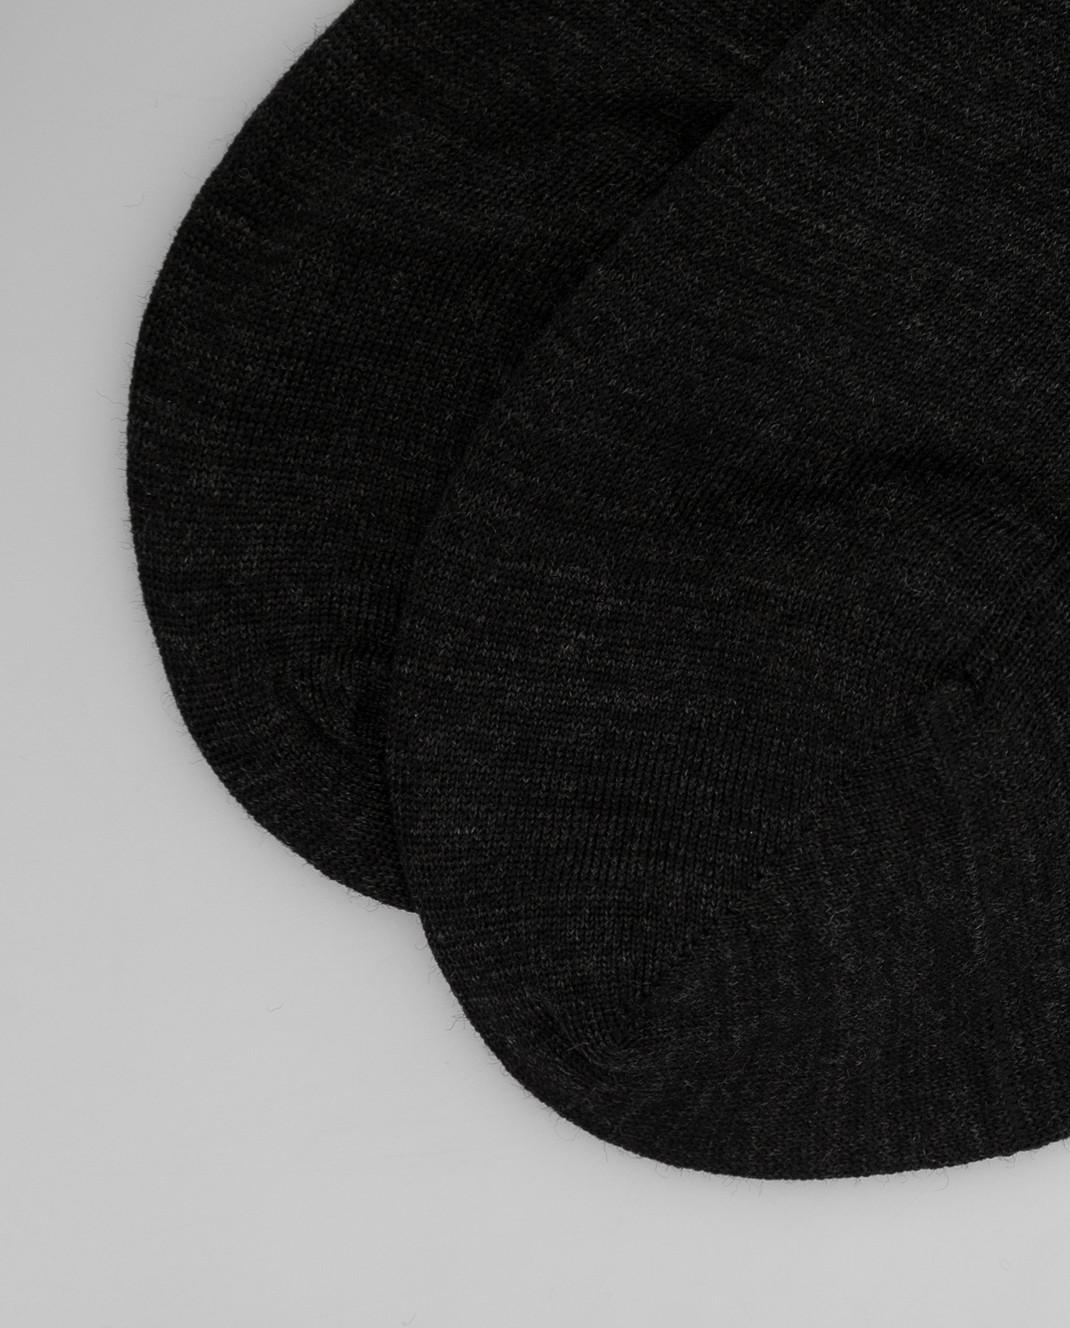 RiminiVeste Темно-серые носки из шерсти WN8011EMINENCE изображение 3